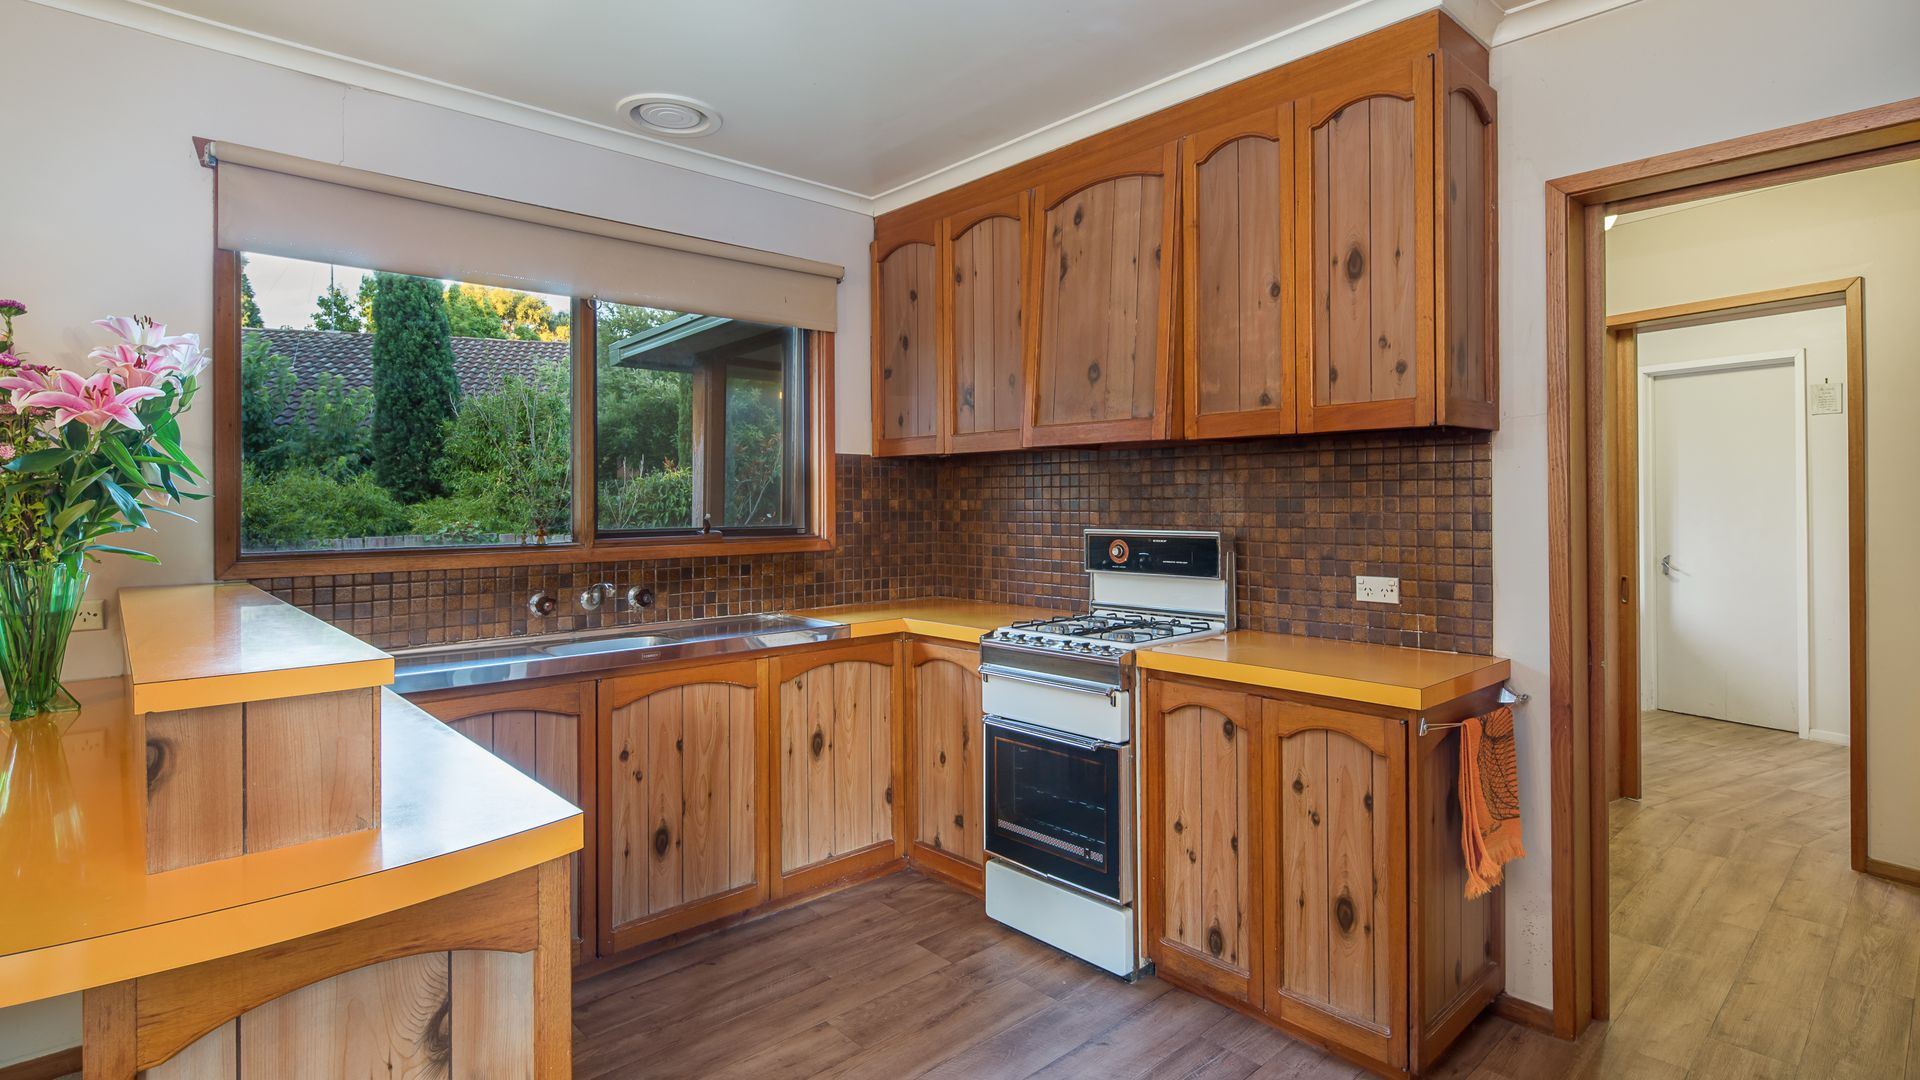 21 Kinnane Court, Ballarat North VIC 3350, Image 2